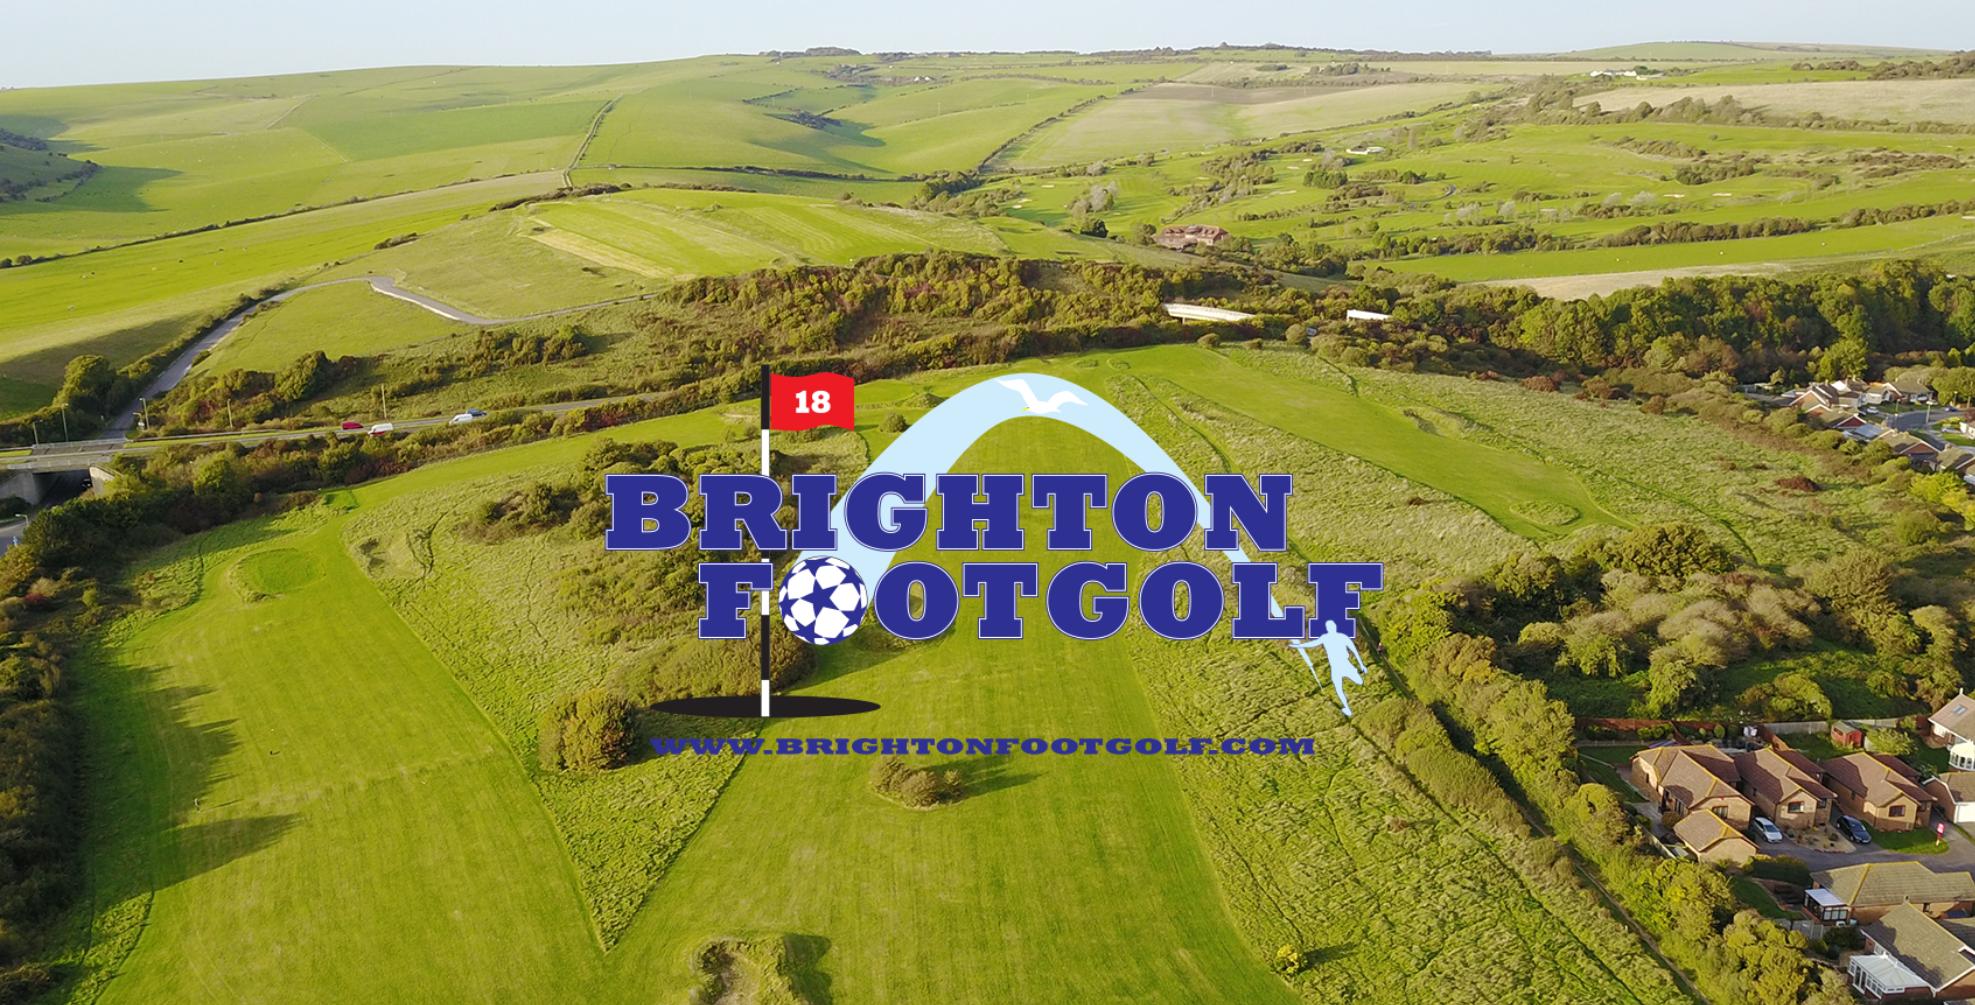 Brighton Footgolf